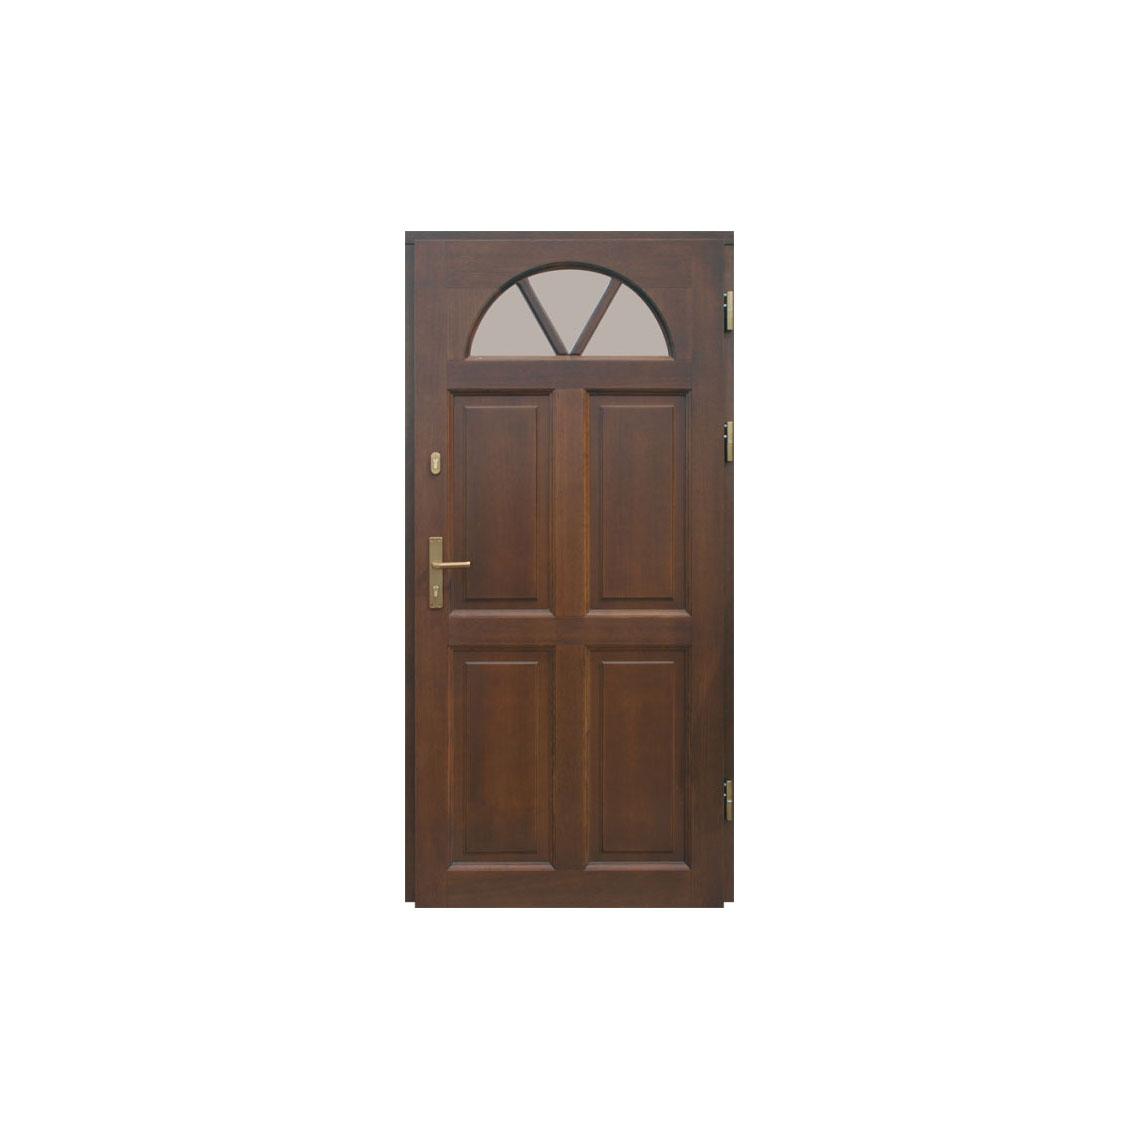 Koka durvis WD-11